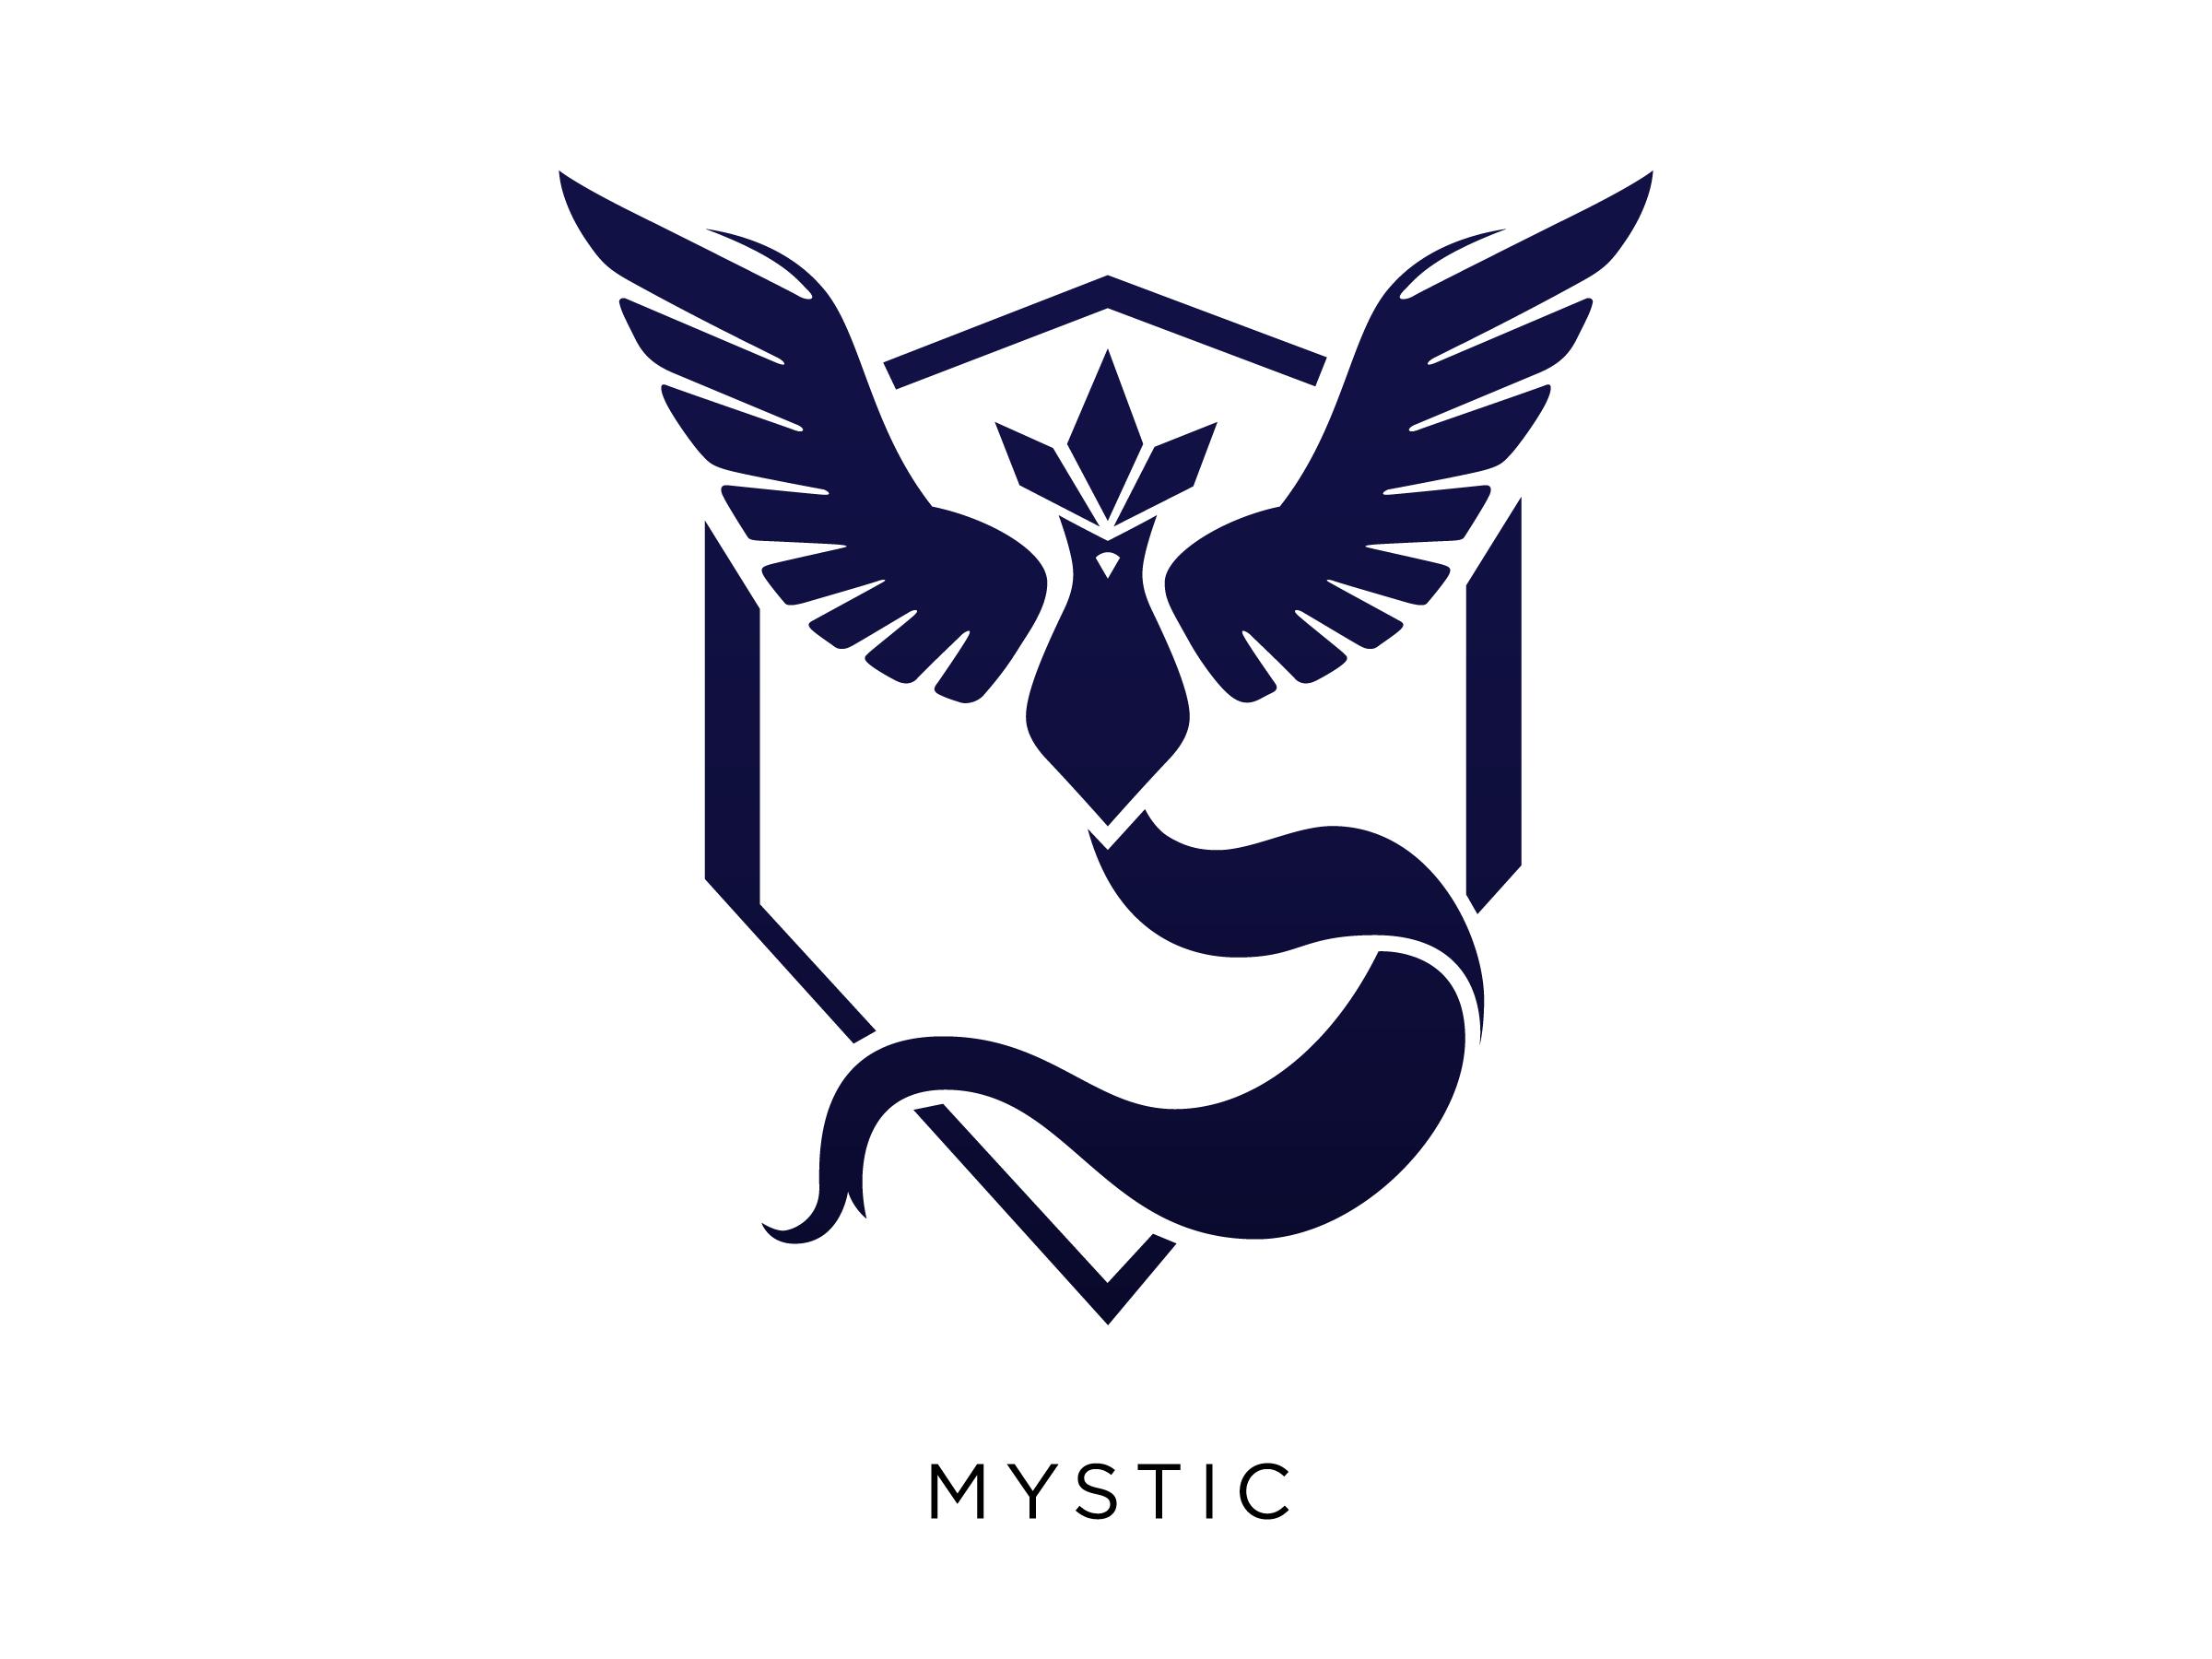 dribbble pokemongo team logos mystic png by meritt thomas